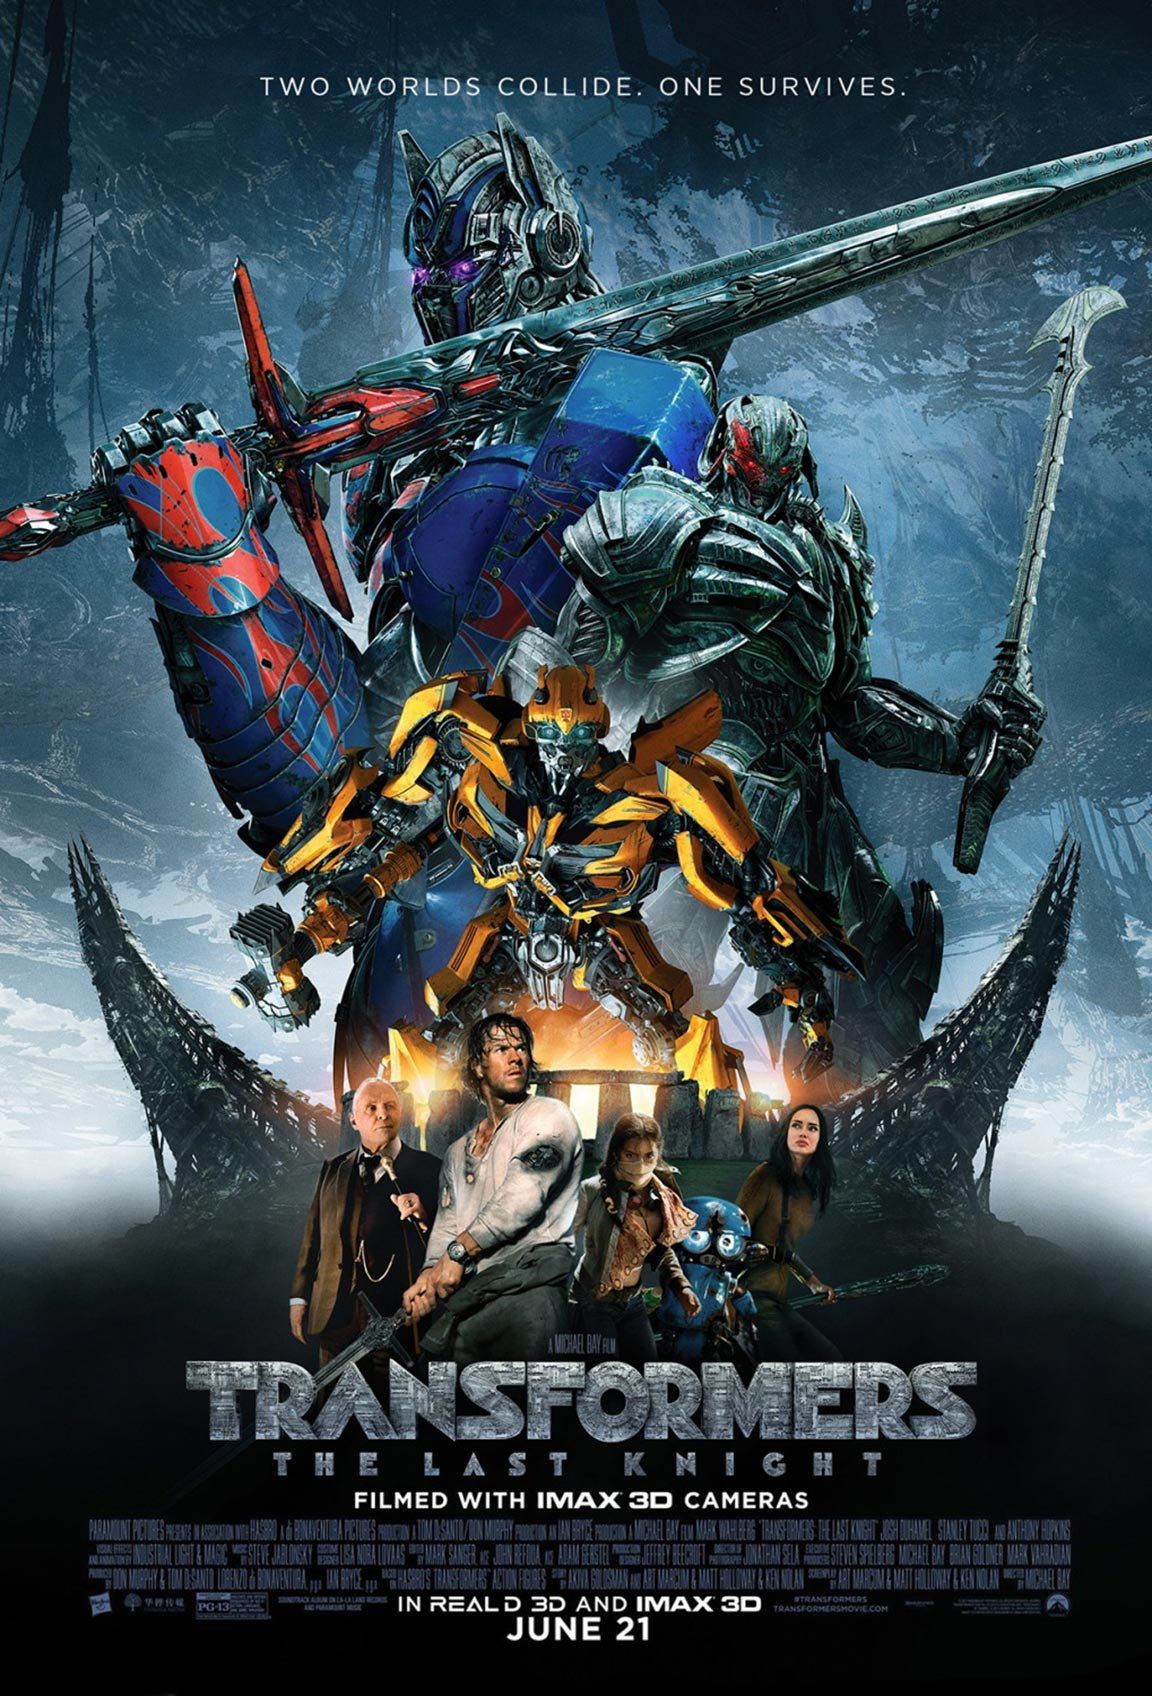 transformers-the-last-knight-8.jpg